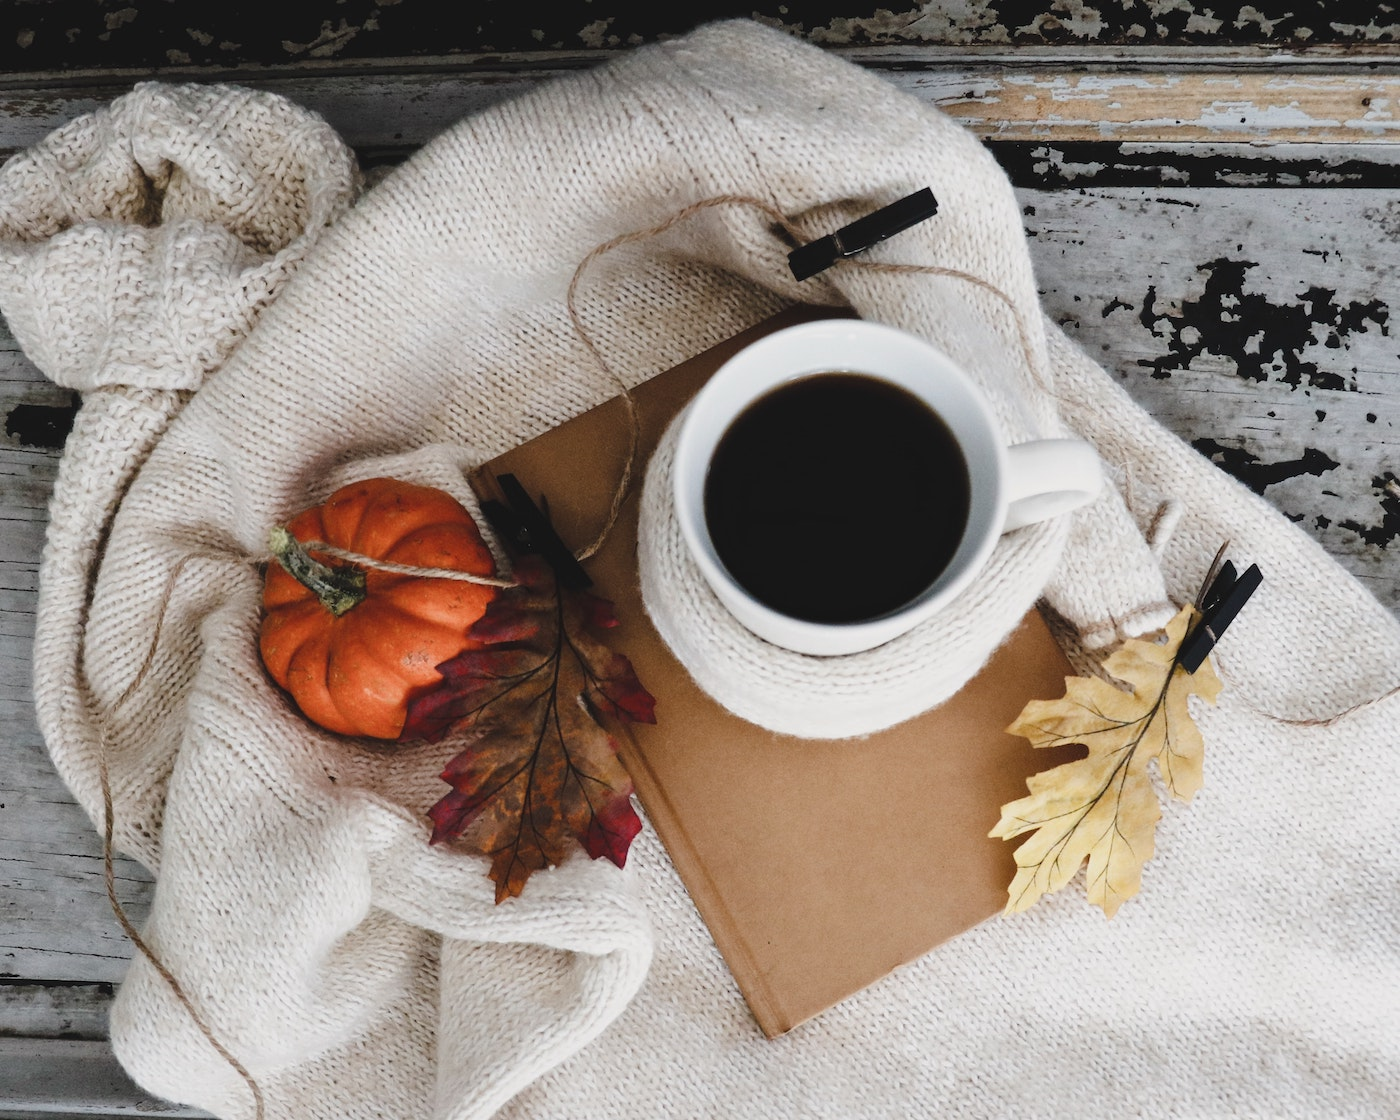 Coffee on ivory blanket